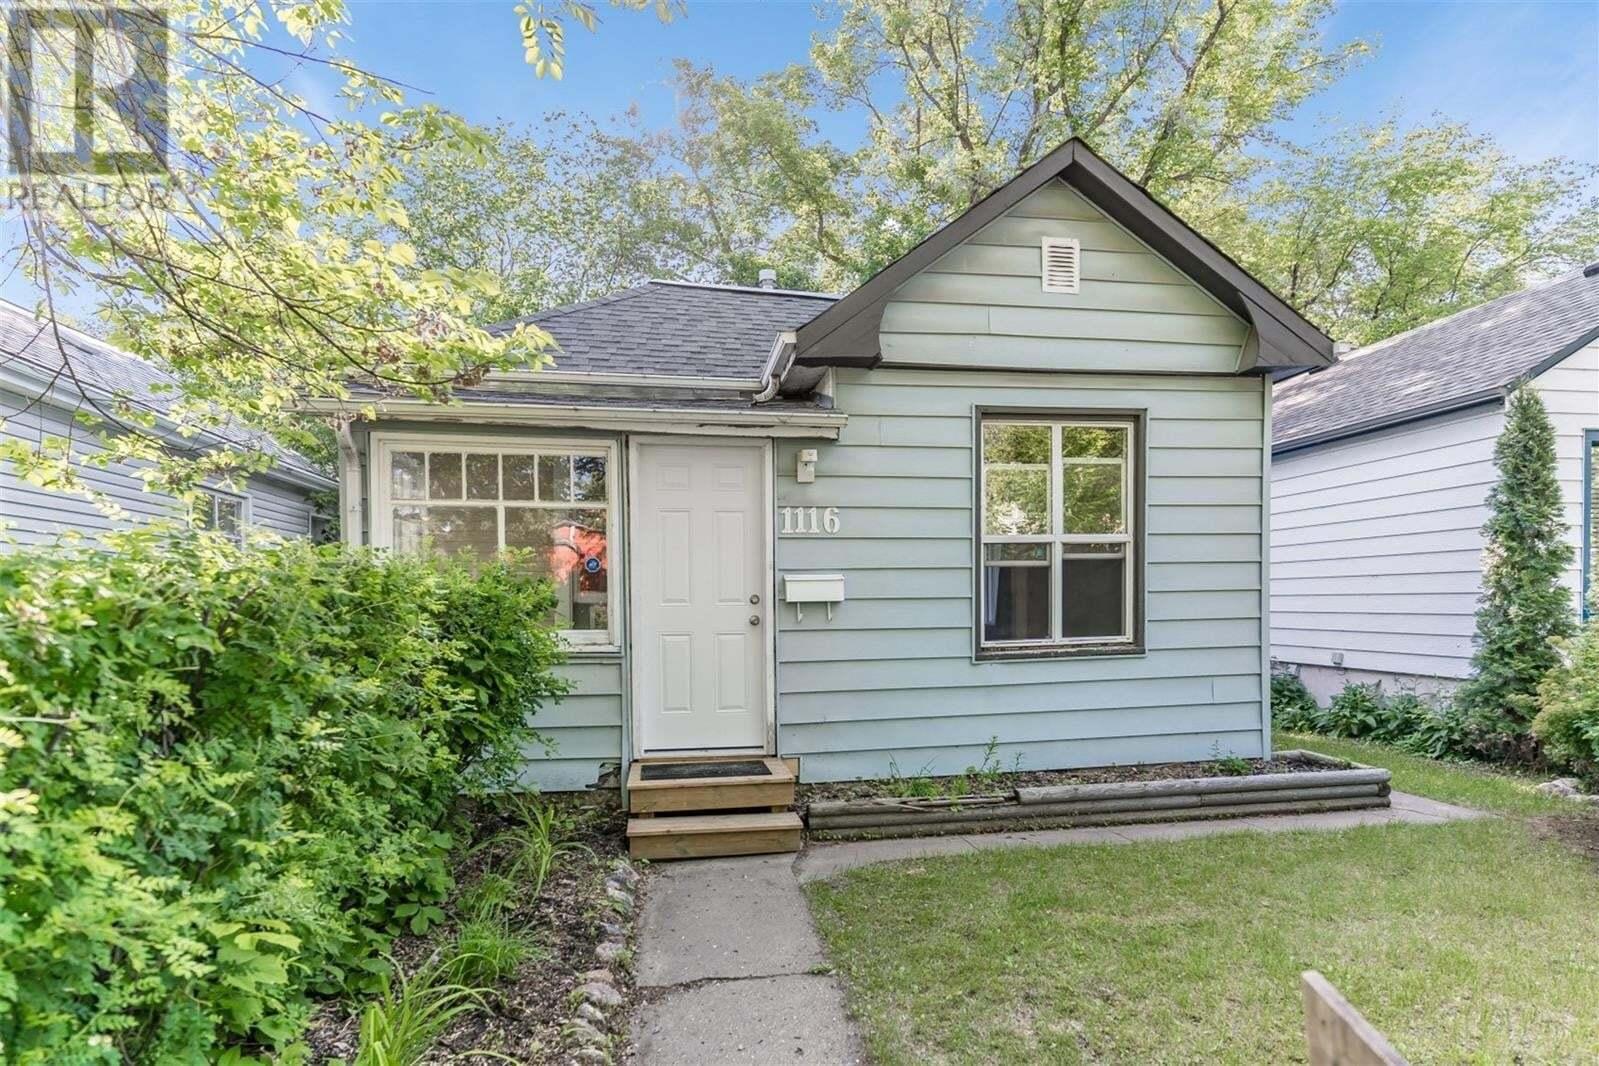 House for sale at 1116 B Ave N Saskatoon Saskatchewan - MLS: SK814460